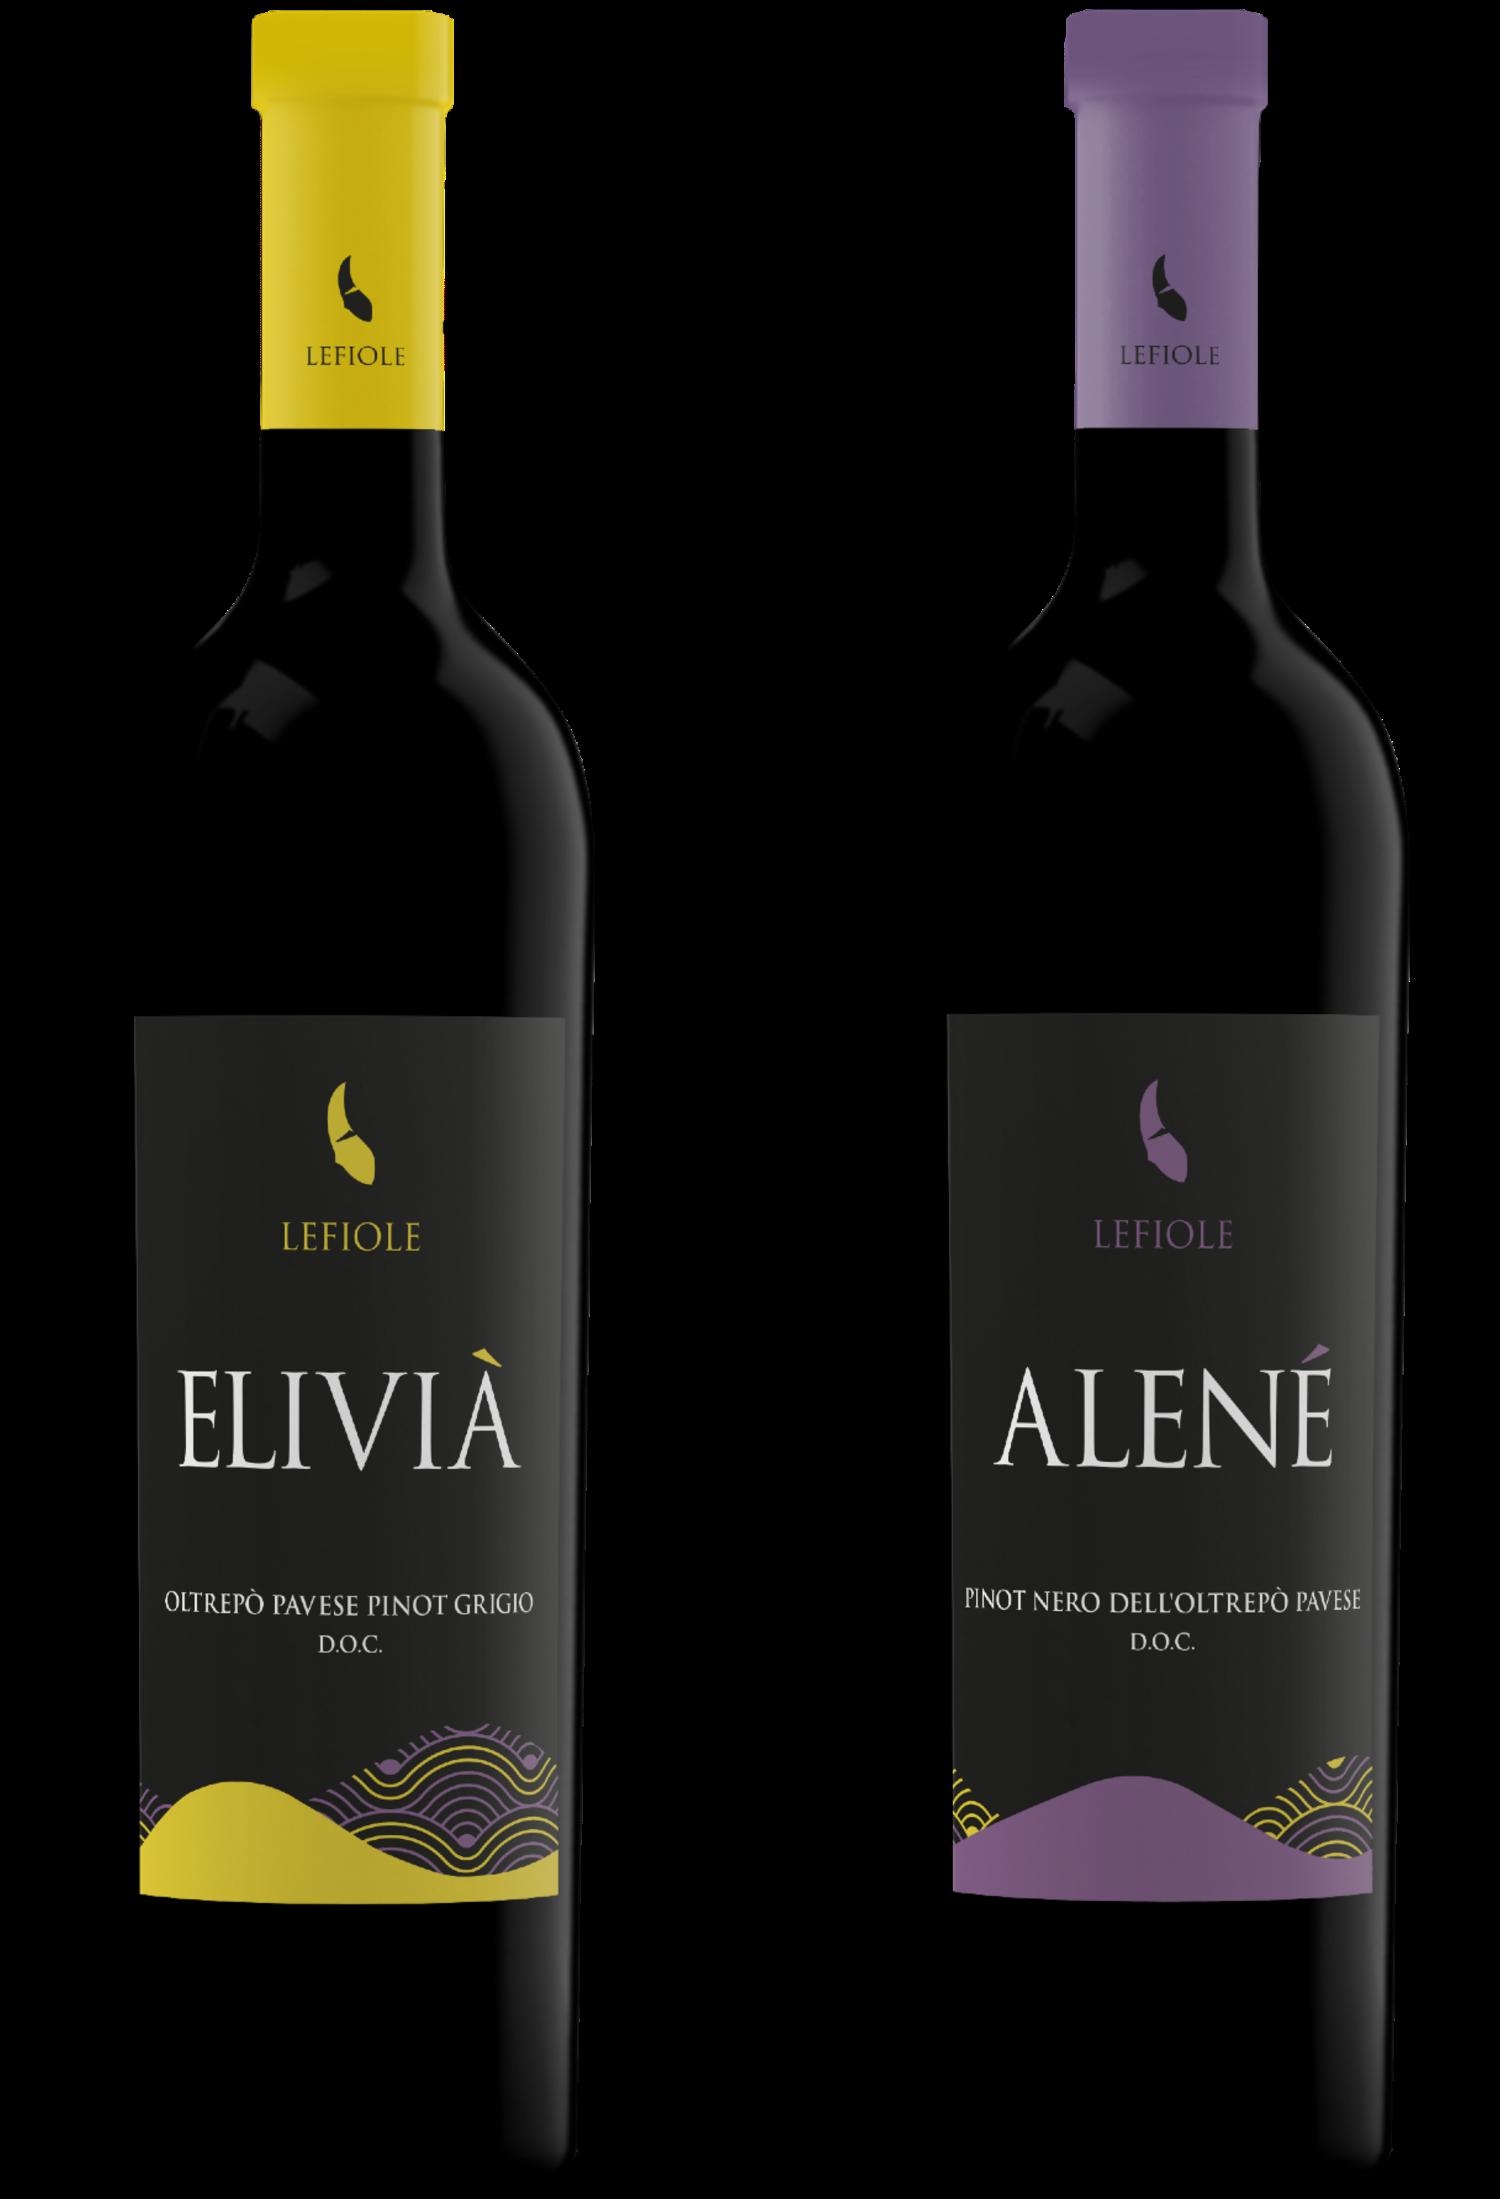 Lefiole Vino Vini Oltrepo Pavese Piaggi Lombardia